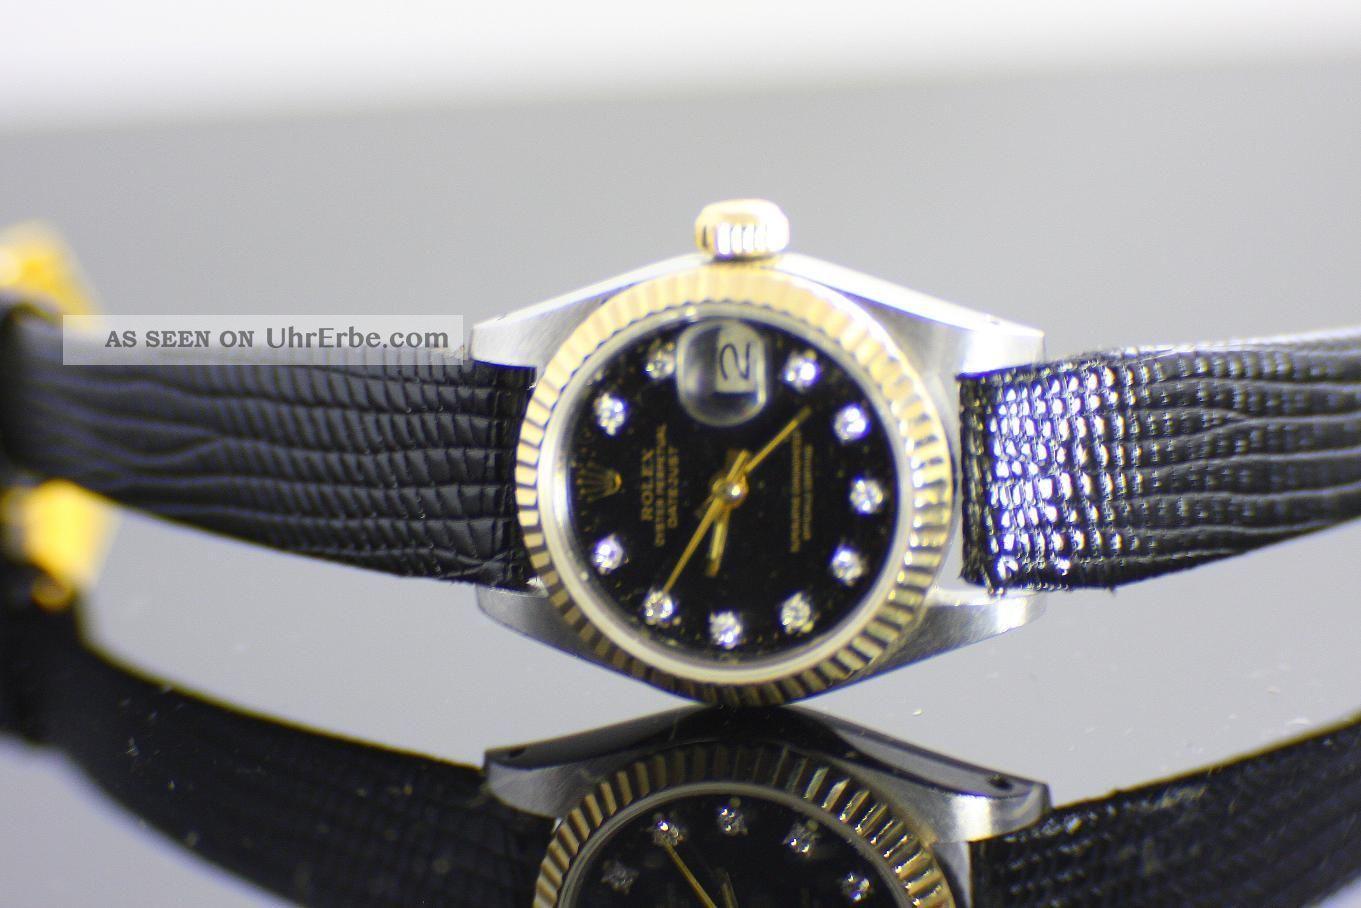 Rolex Oyster Perpetual Datejust Chronometer Ca.  1970 10 Diamanten Armbanduhren Bild